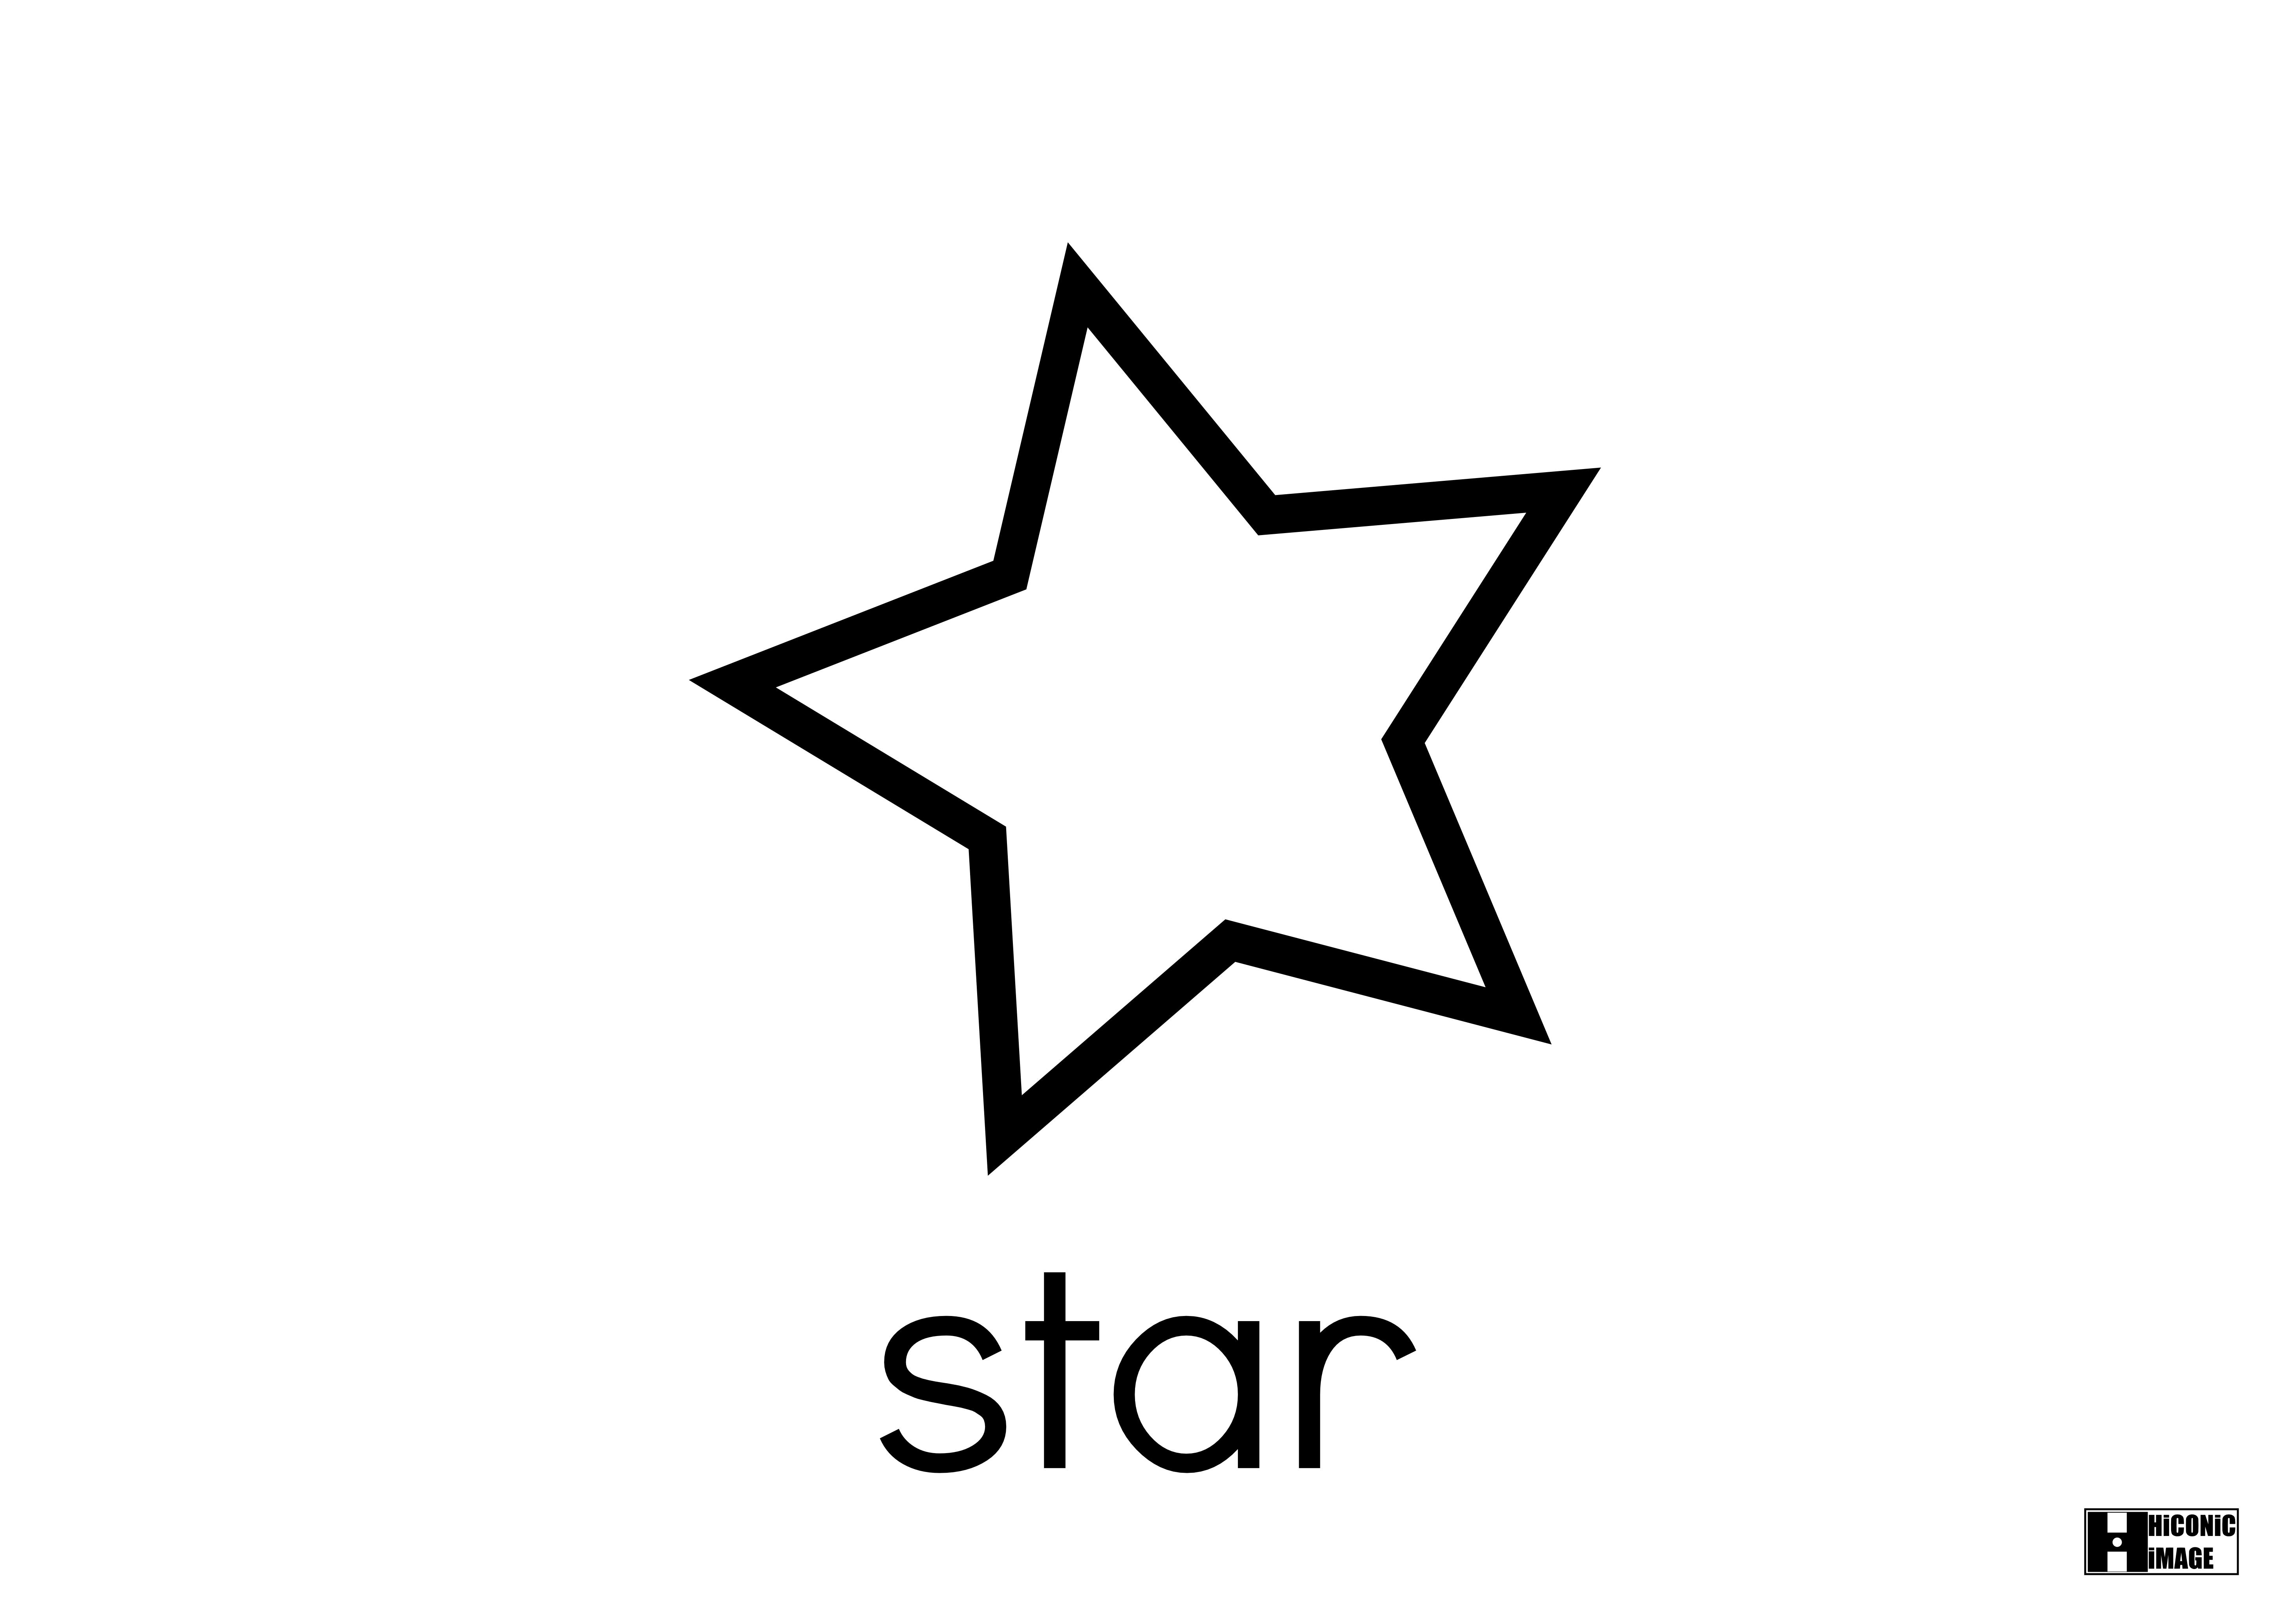 Star Shape Images